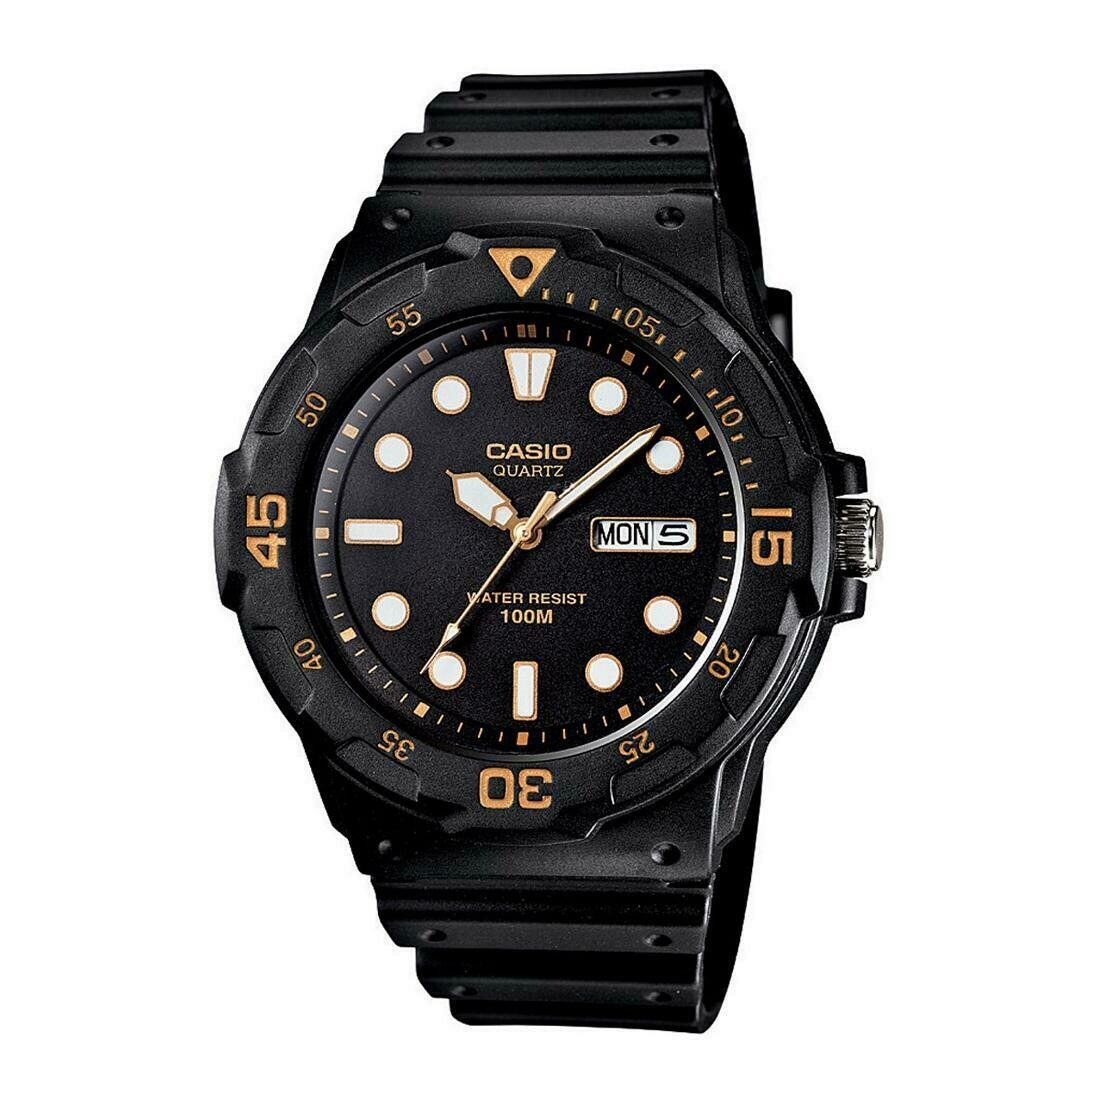 Casio Youth MRW-200H-1EVDF Wrist Watch For Men - Black